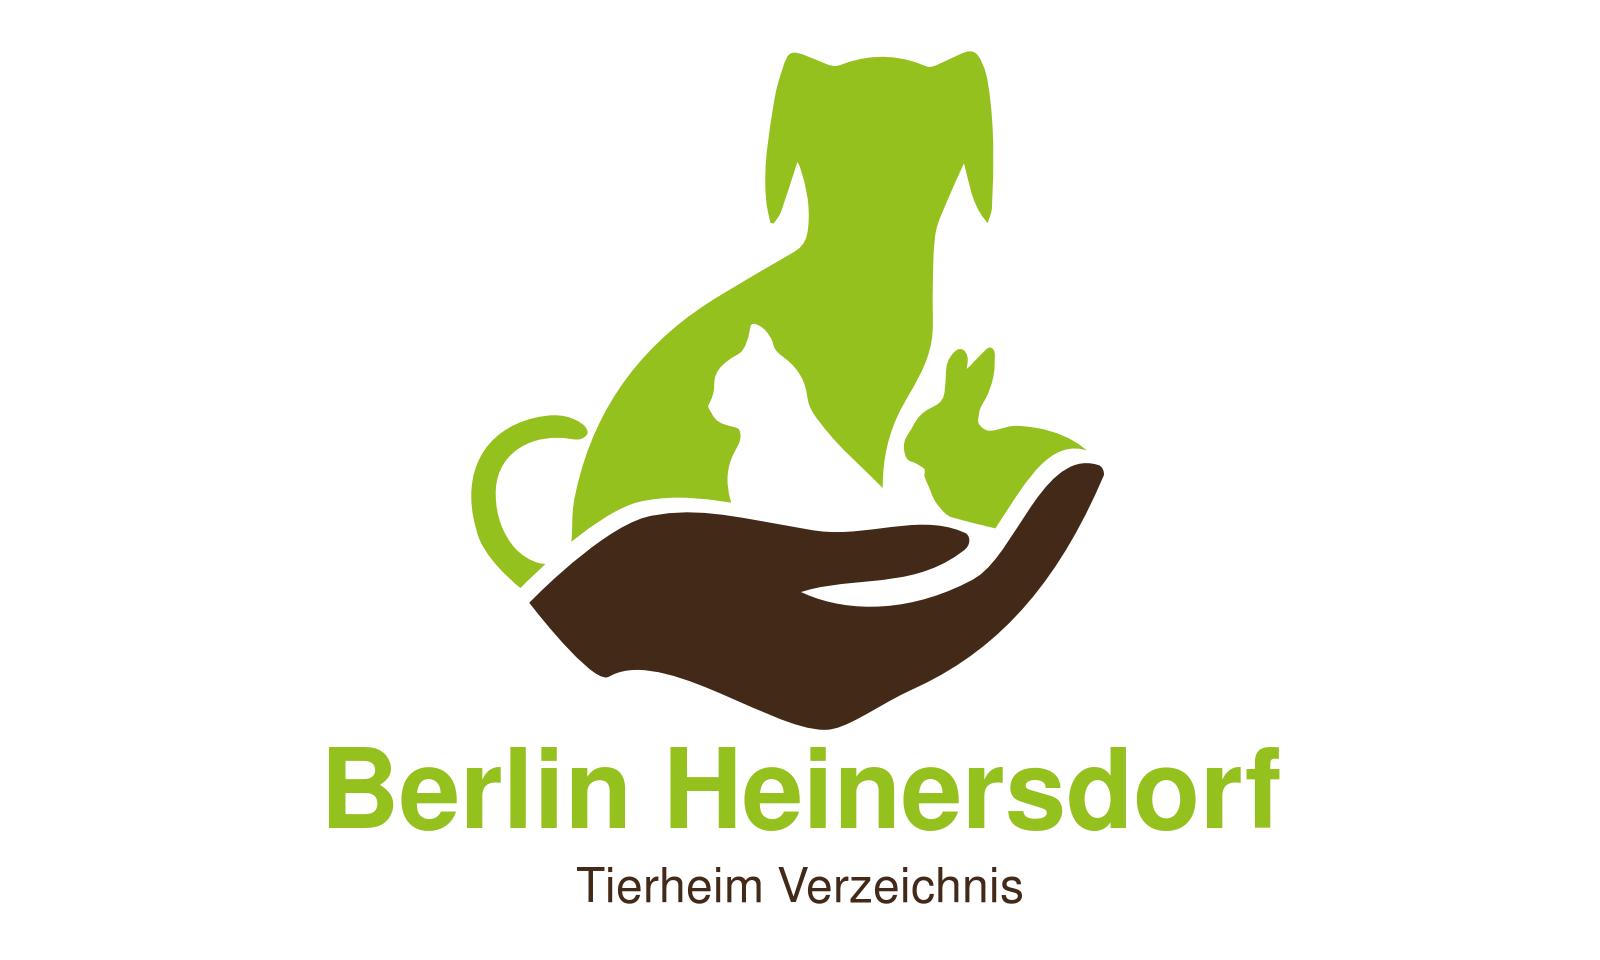 Tierheim Berlin Heinersdorf